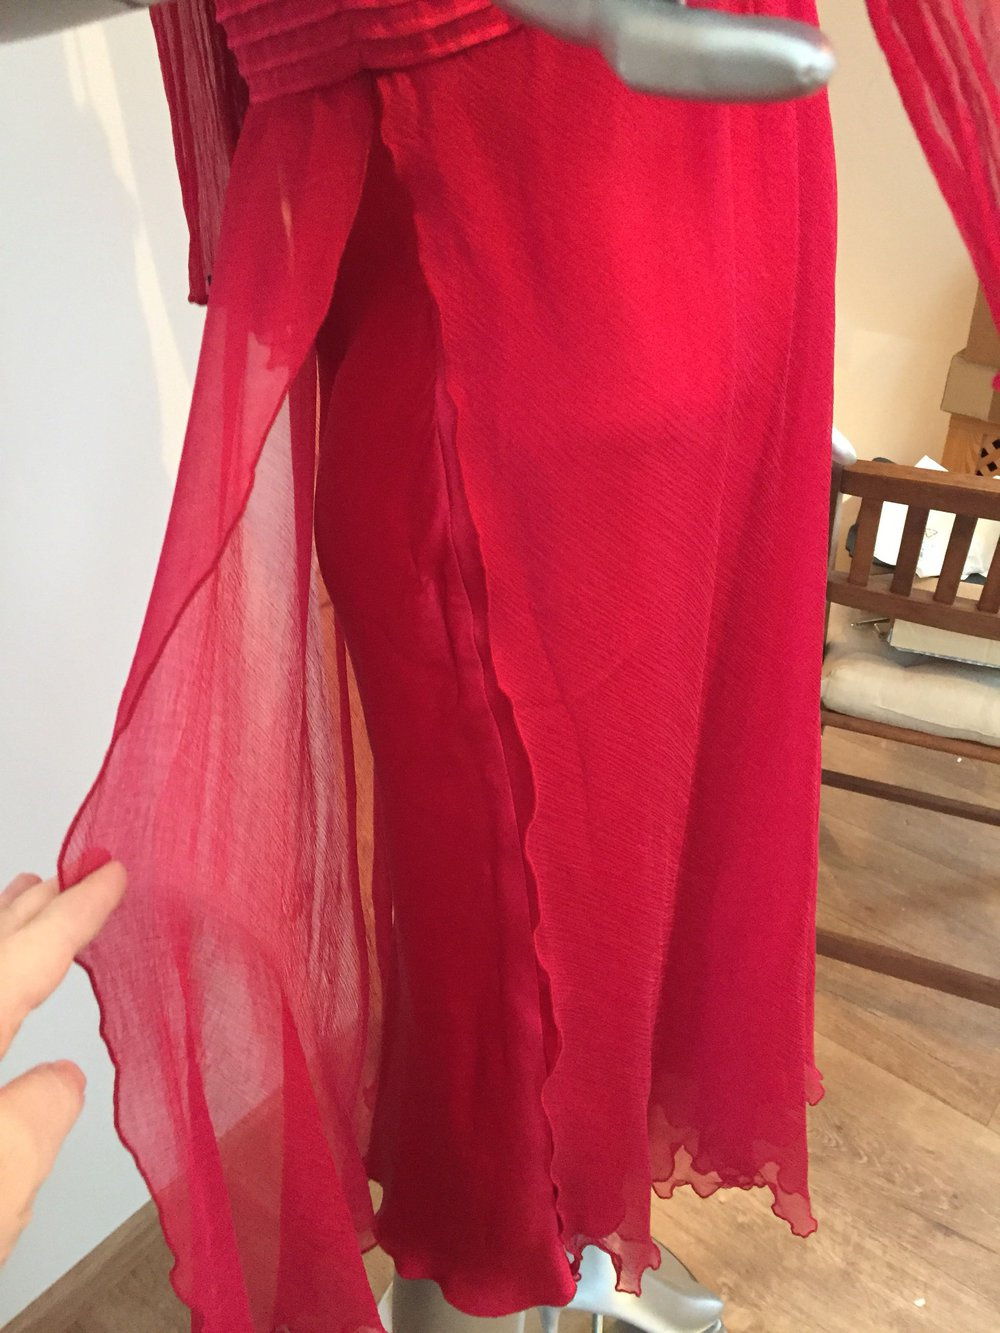 Nicowa Pailletten Abendkleid Partykleid rot :: Kleiderkorb.de